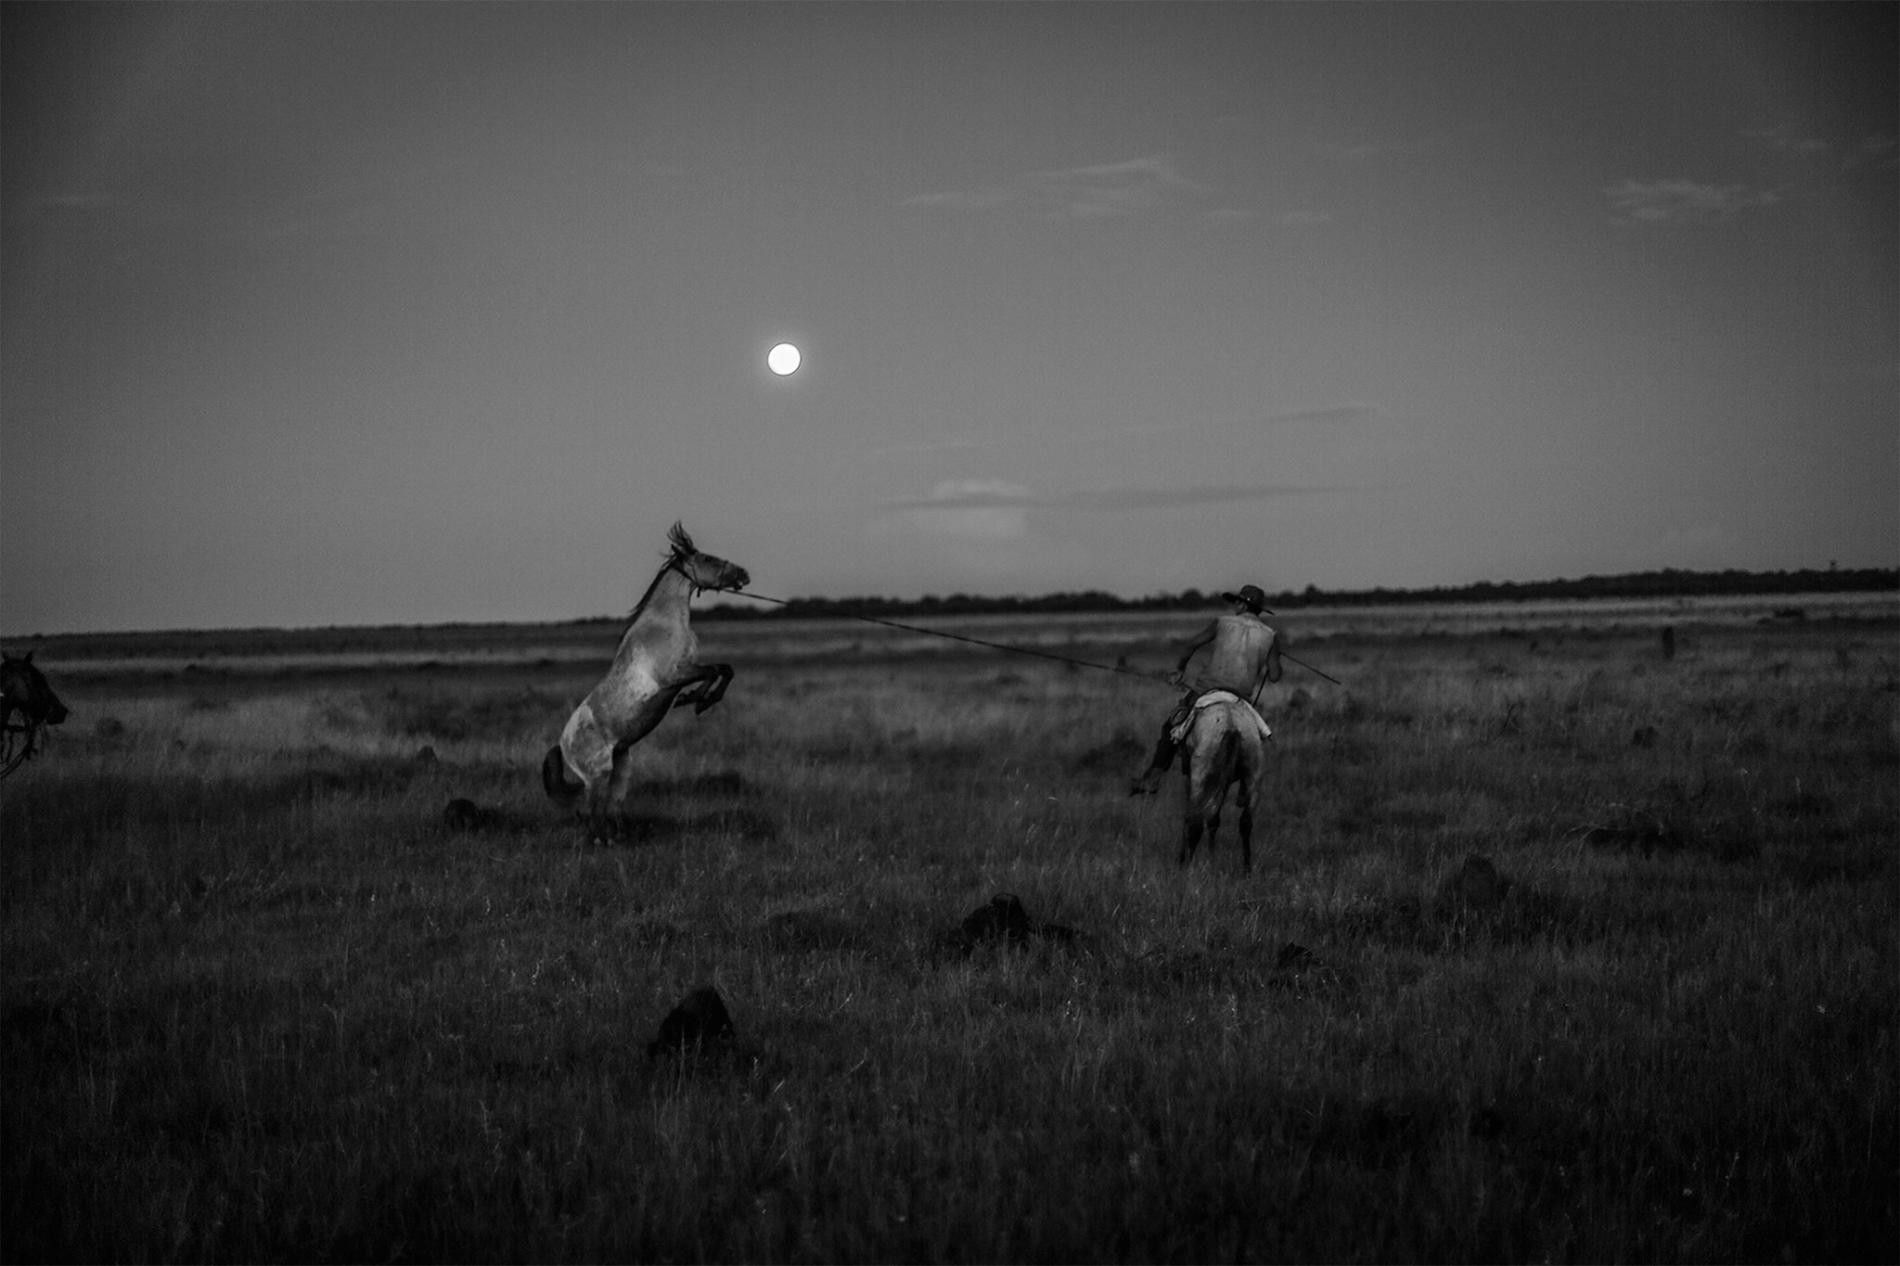 Un llanero apprivoise un cheval sauvage du Casanare, en Colombie.